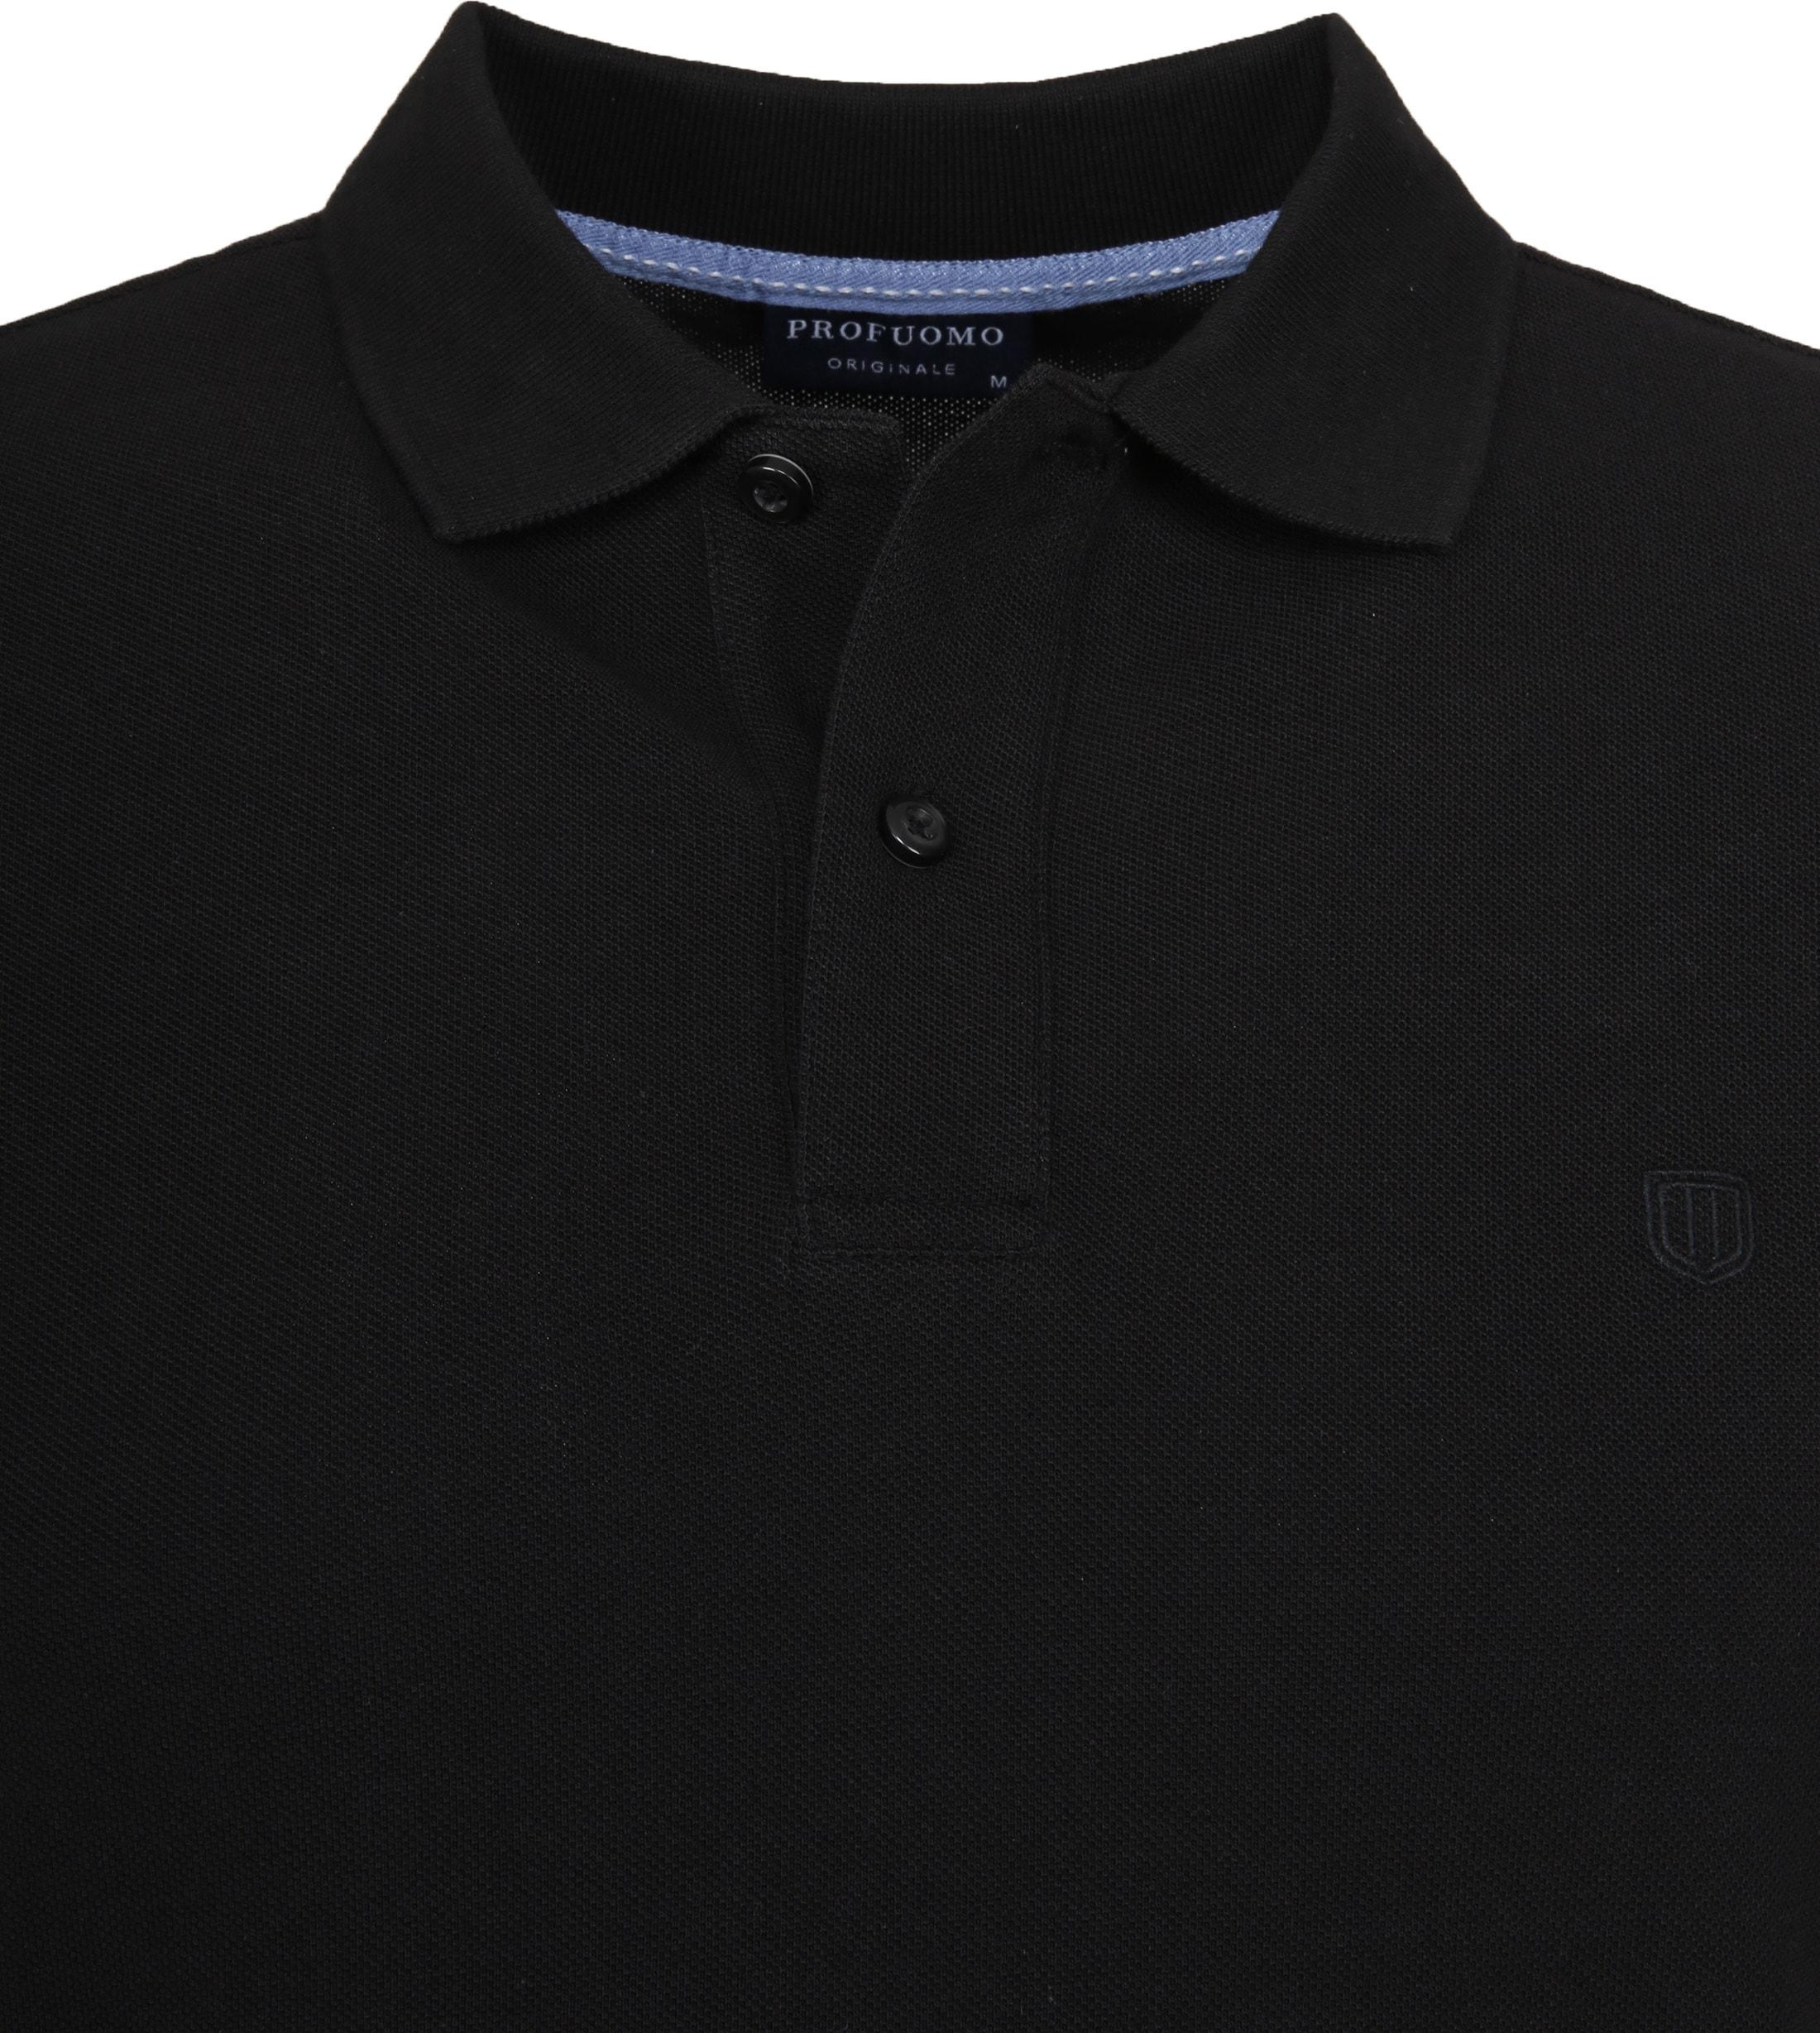 Profuomo Short Sleeve Poloshirt Schwarz foto 1